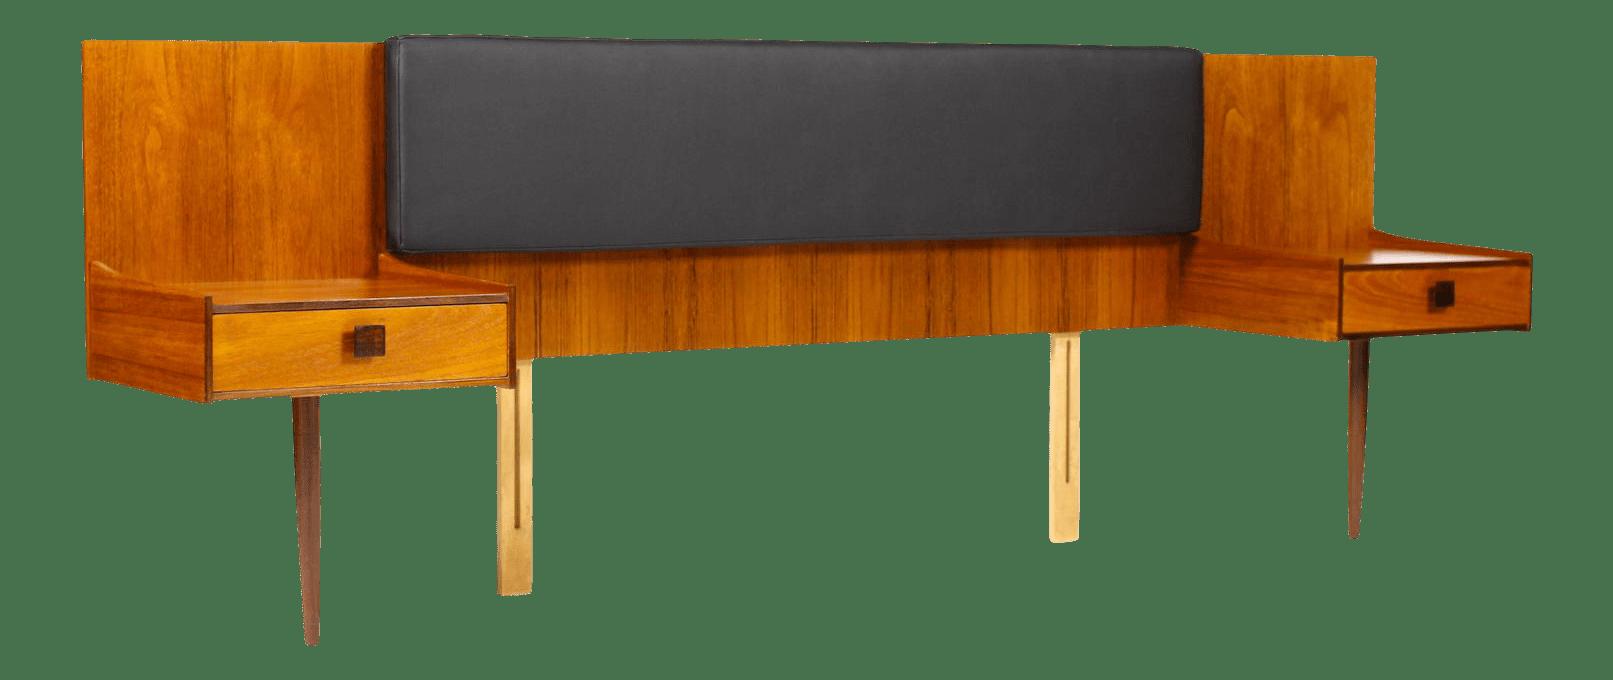 Danish Modern Kofod Larsen For G Plan Teak Headboard Floating Nightstand S